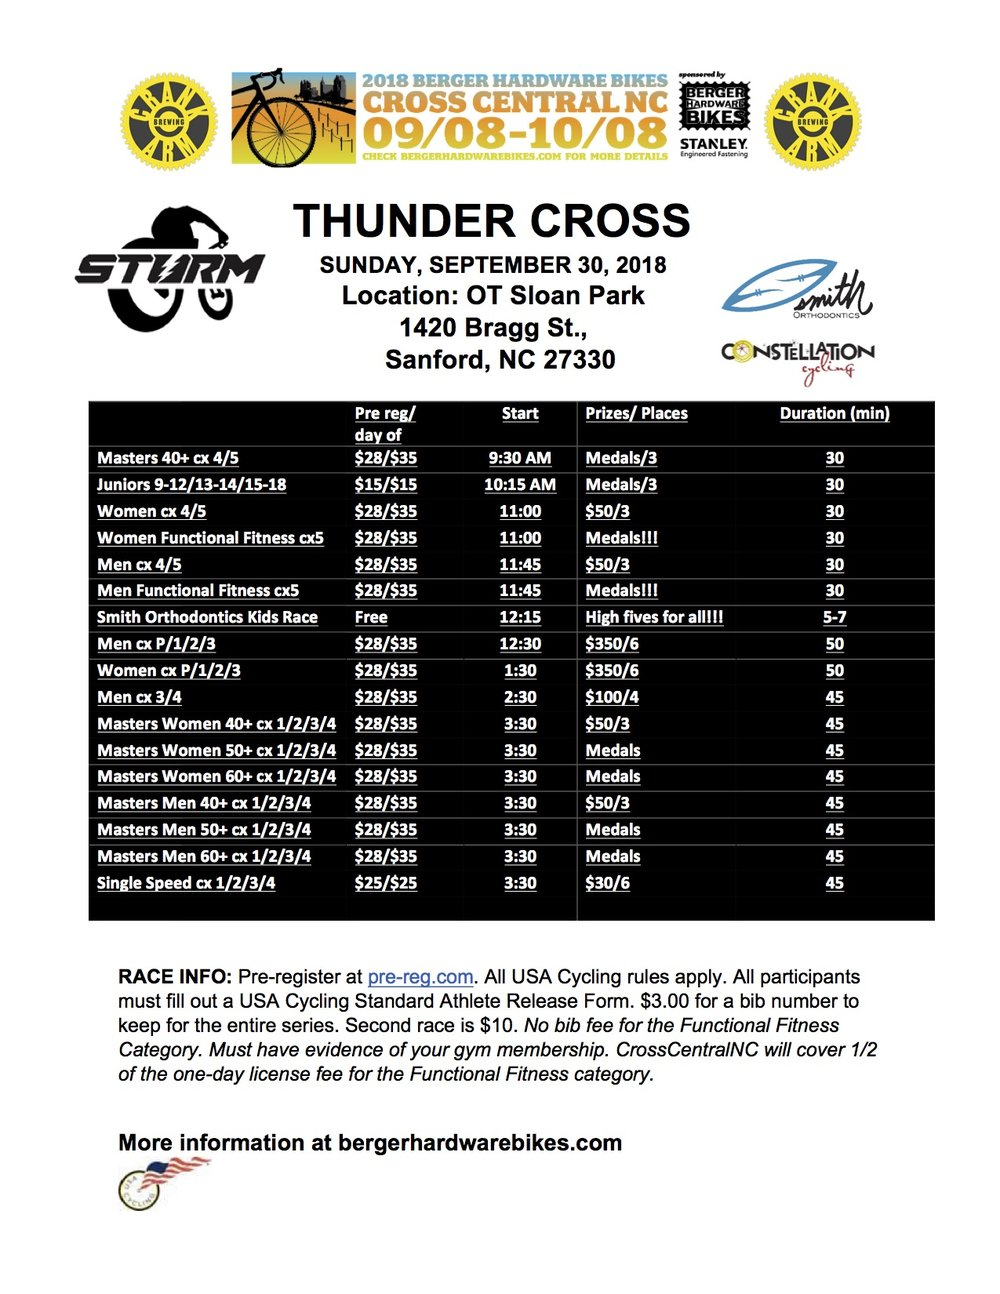 2018 Thundercross flyer_final.jpeg